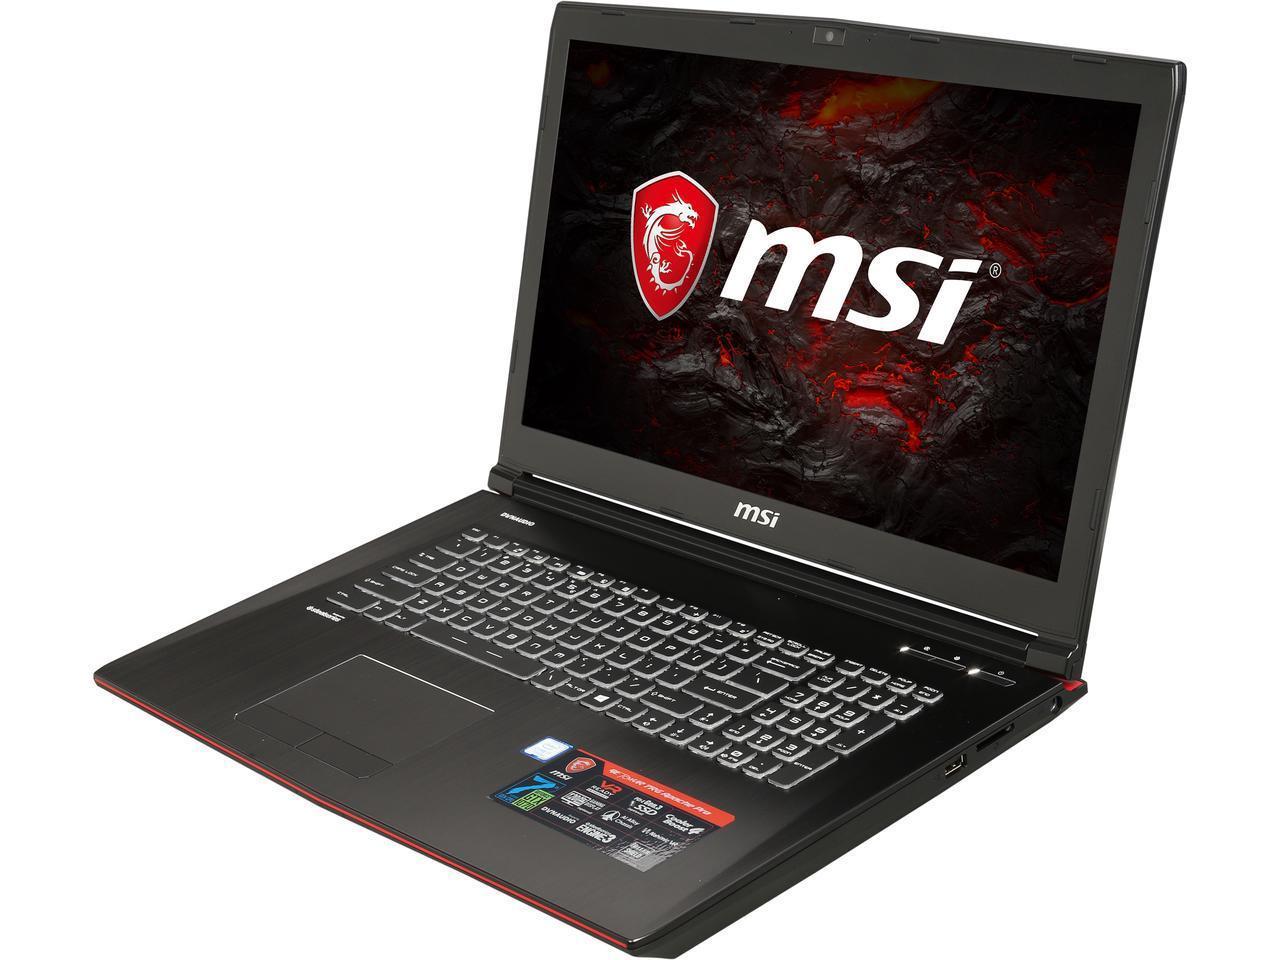 MSI GE72MVR APACHE PRO-080 17.3 & 120 Hz GTX 1070 8GB VRAM i7-7700HQ 16GB Memory 128 GB NVMe SSD + 1TB HDD Laptop $1049 After $200 Rebate & PROMO Code